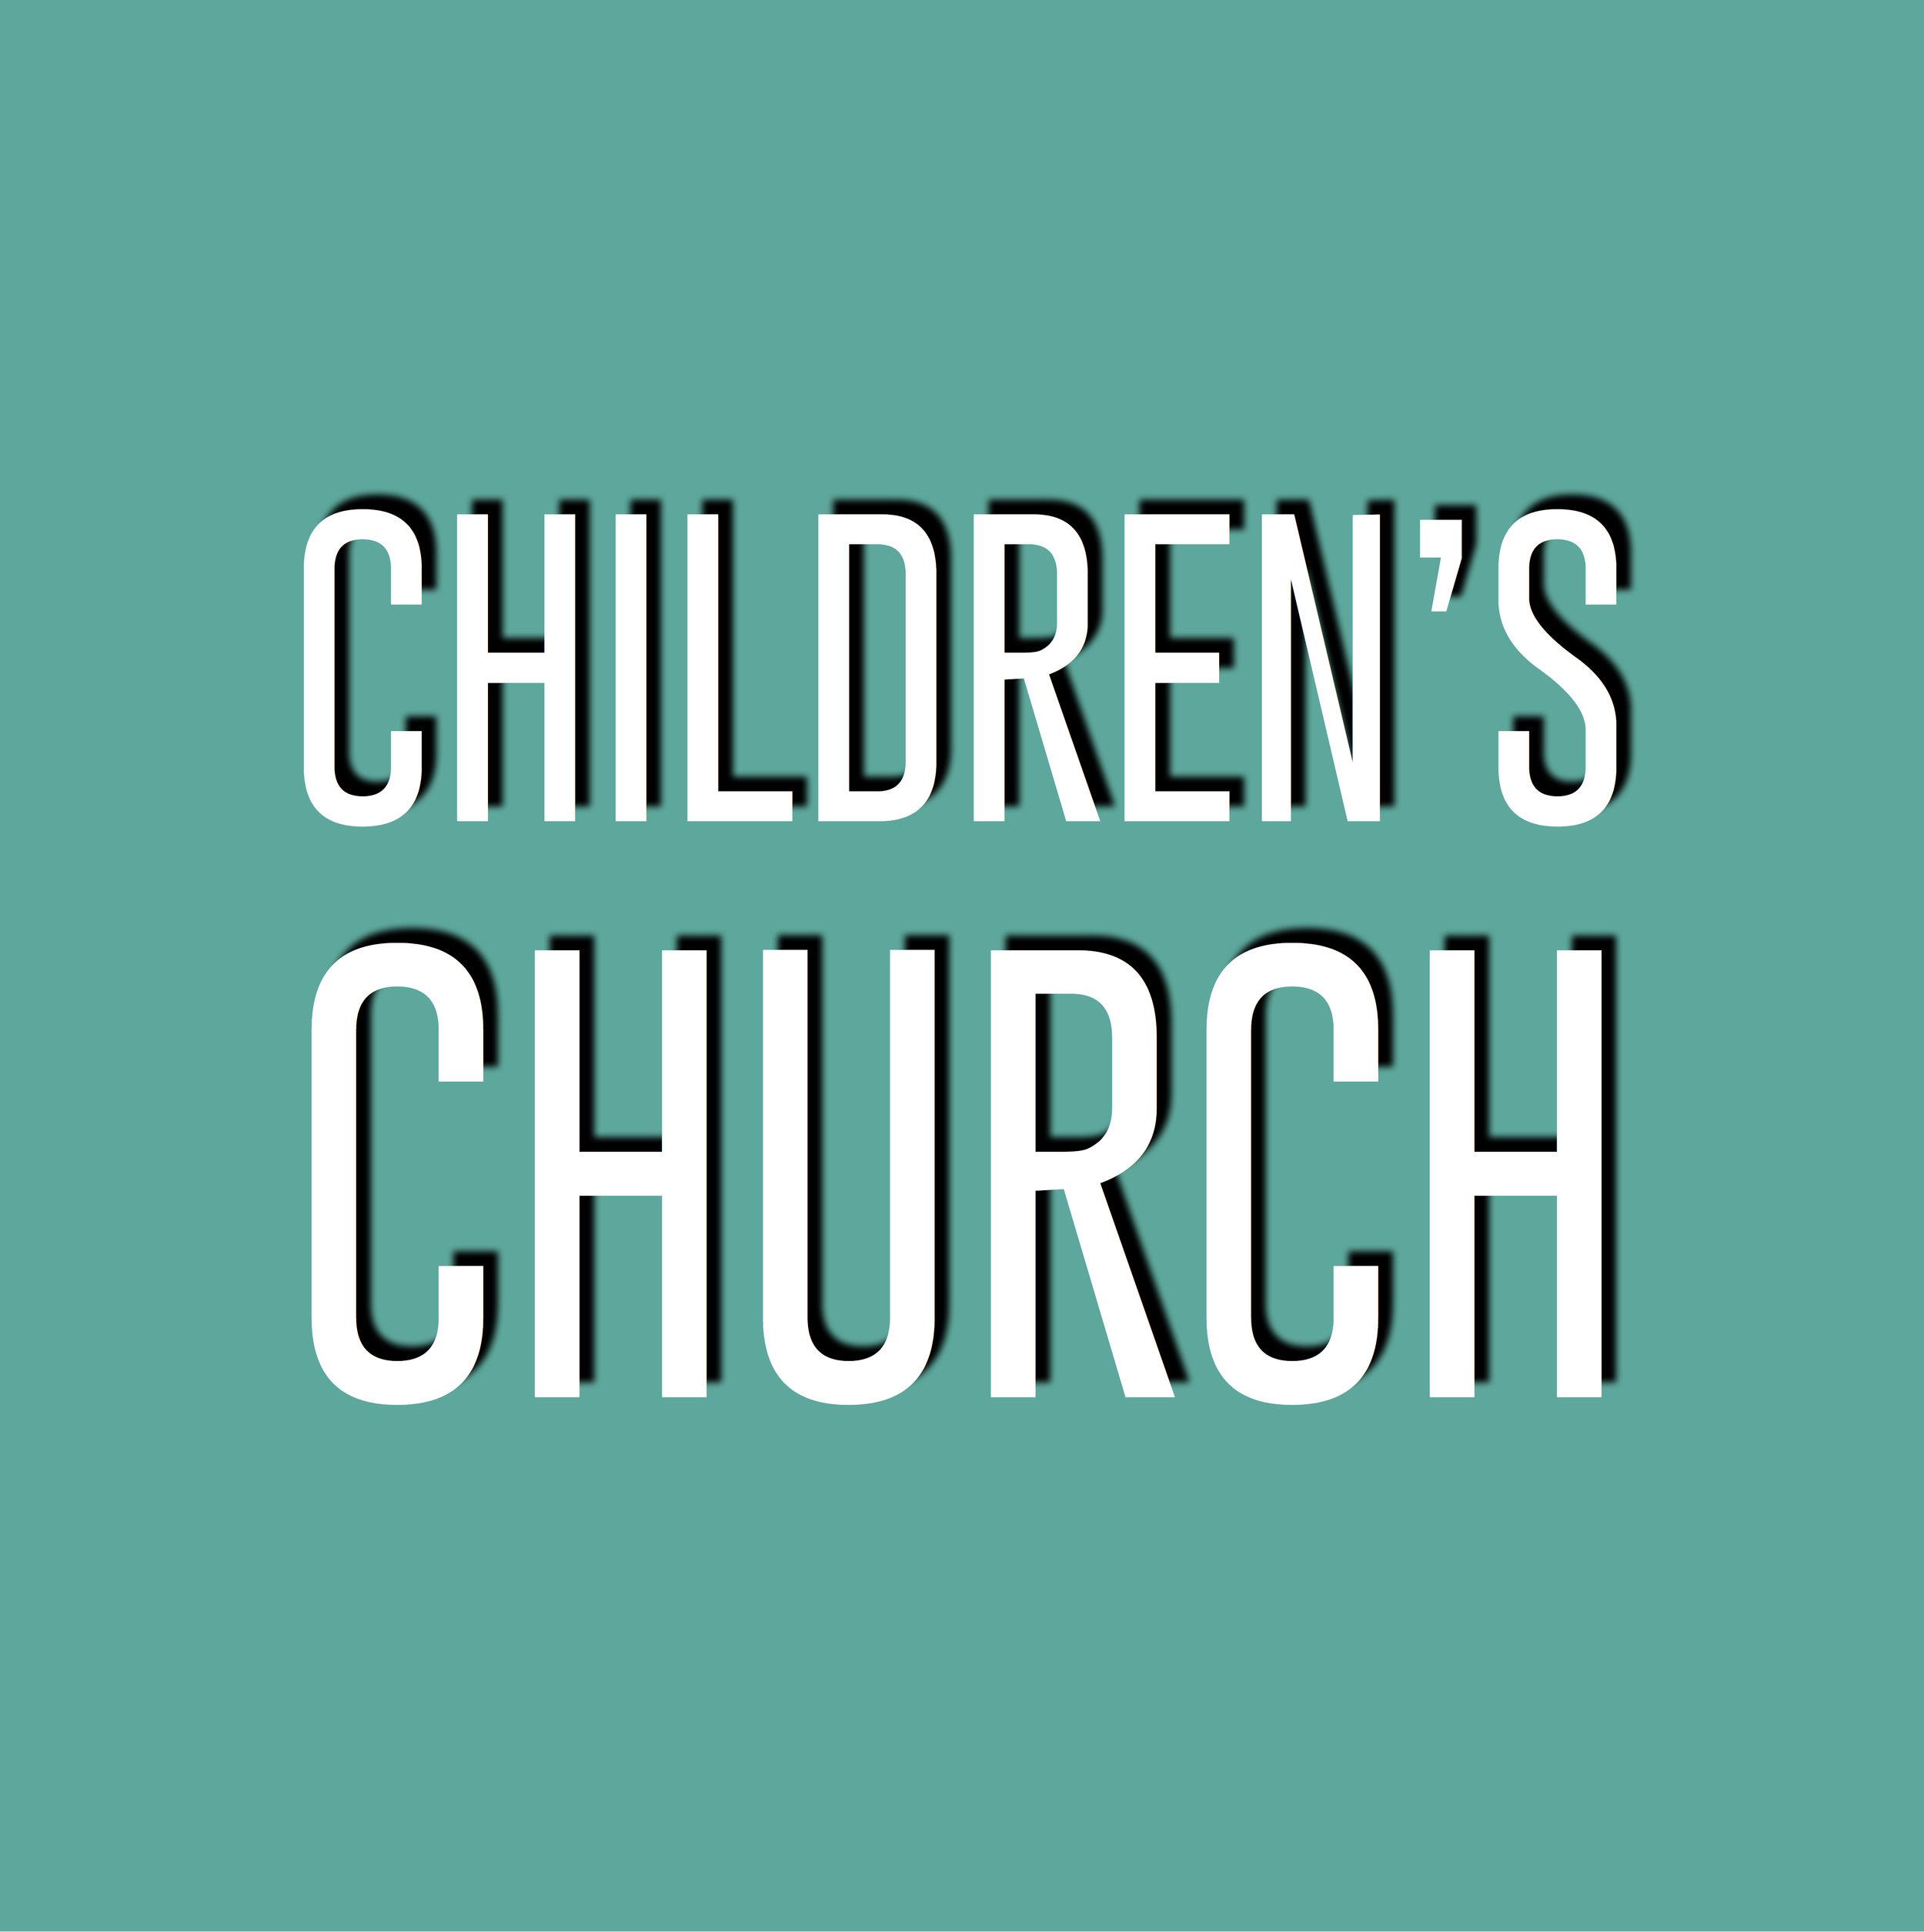 Childrens Church.jpeg